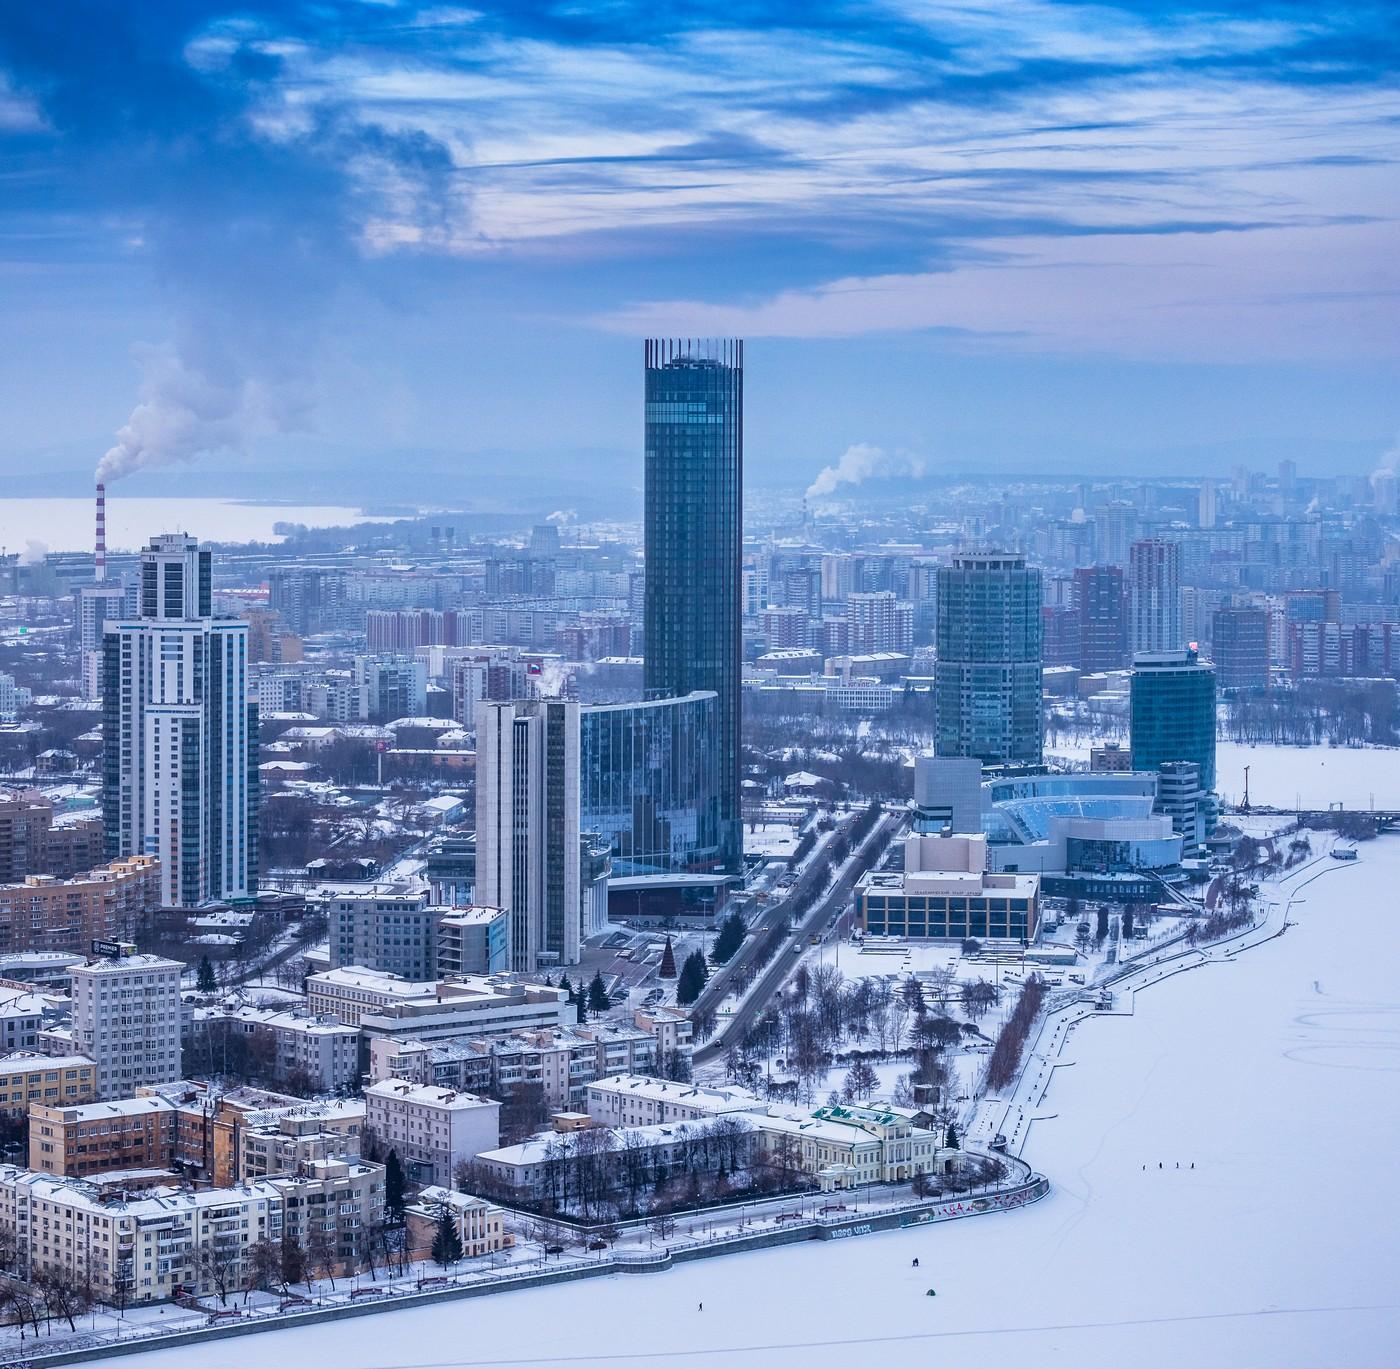 Шаблон человеку, картинки екатеринбург зимой